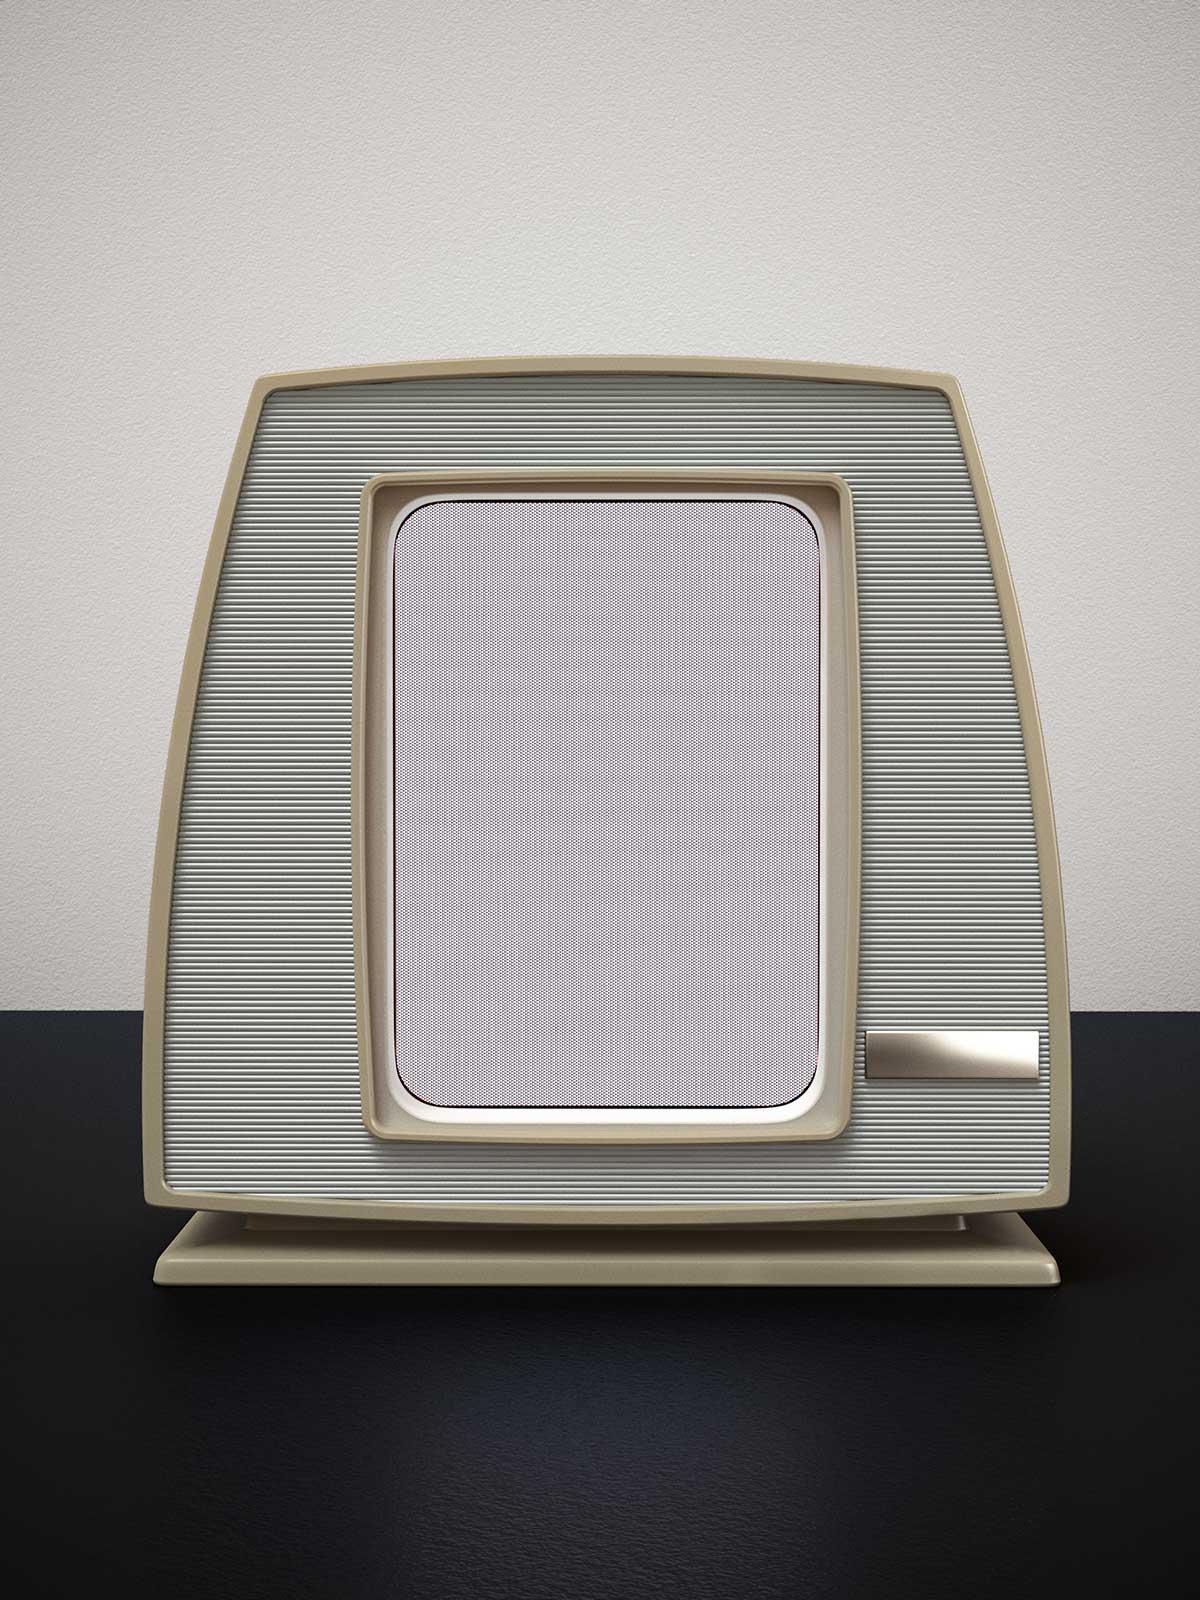 Monitor I 08, CGI Fine Art Print, 52 x 39 cm, 2013